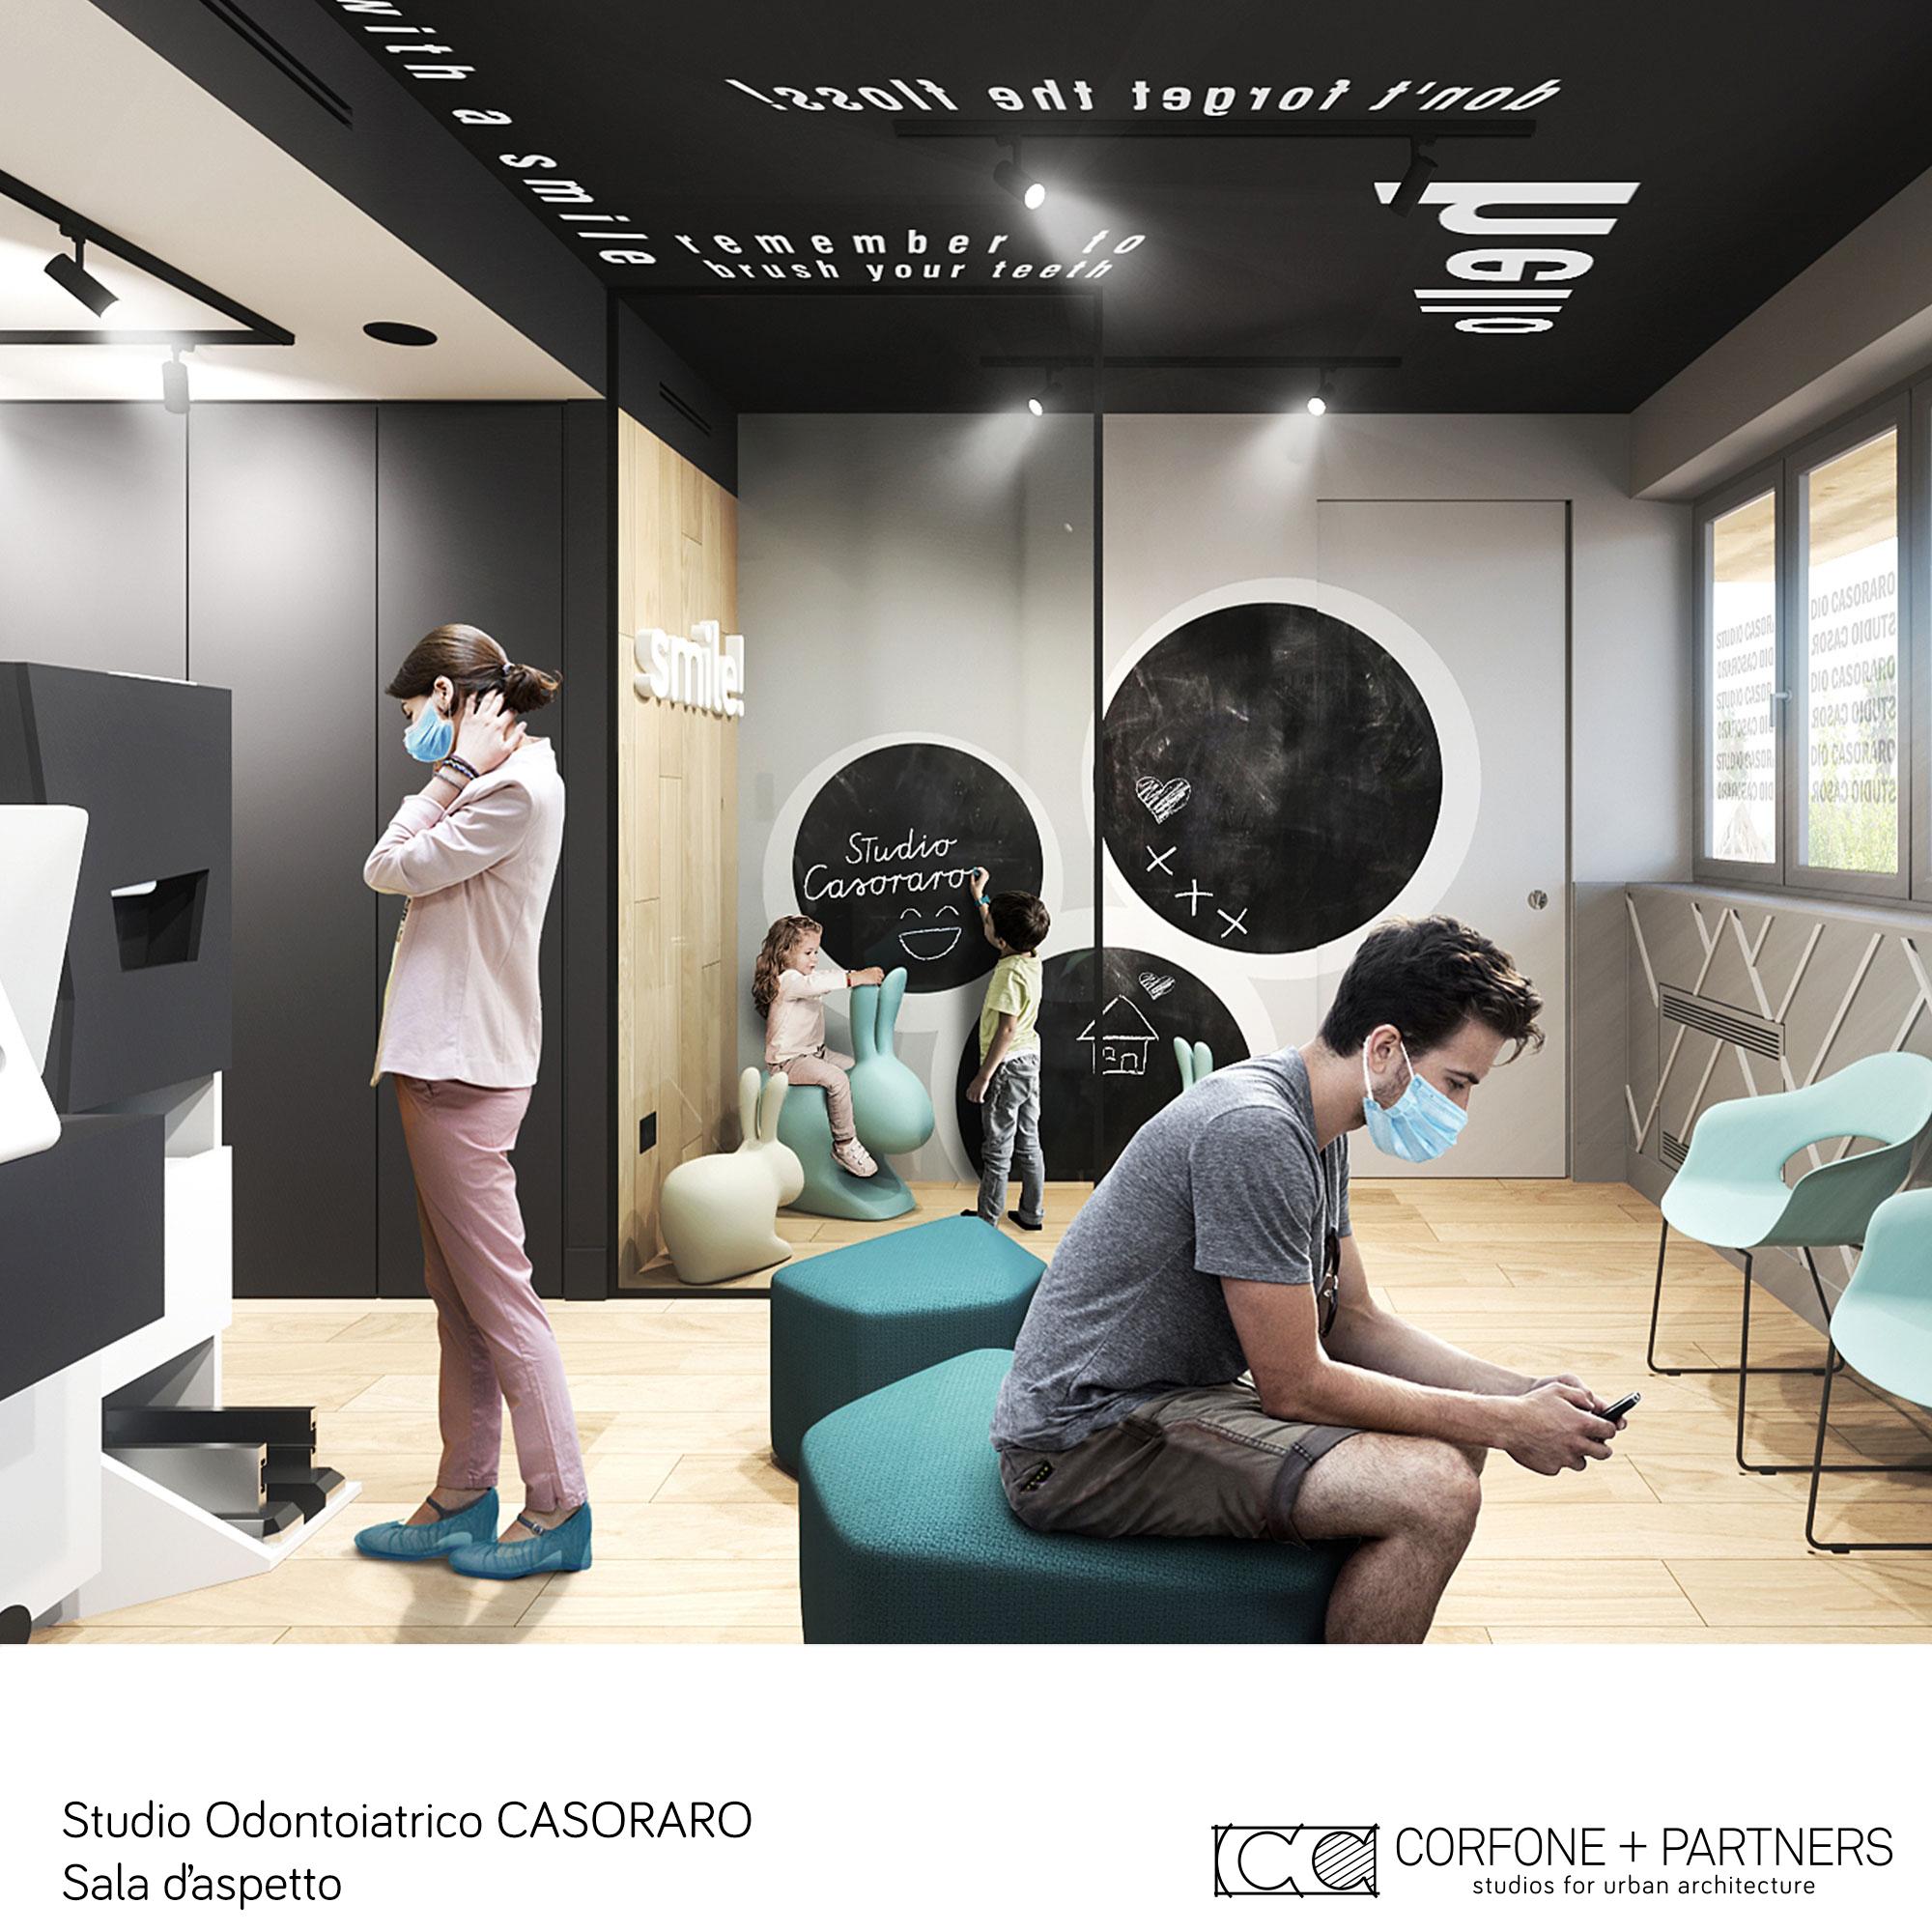 Progetto-Studio-Odontoiatrico-CASORARO-Pescara - 04